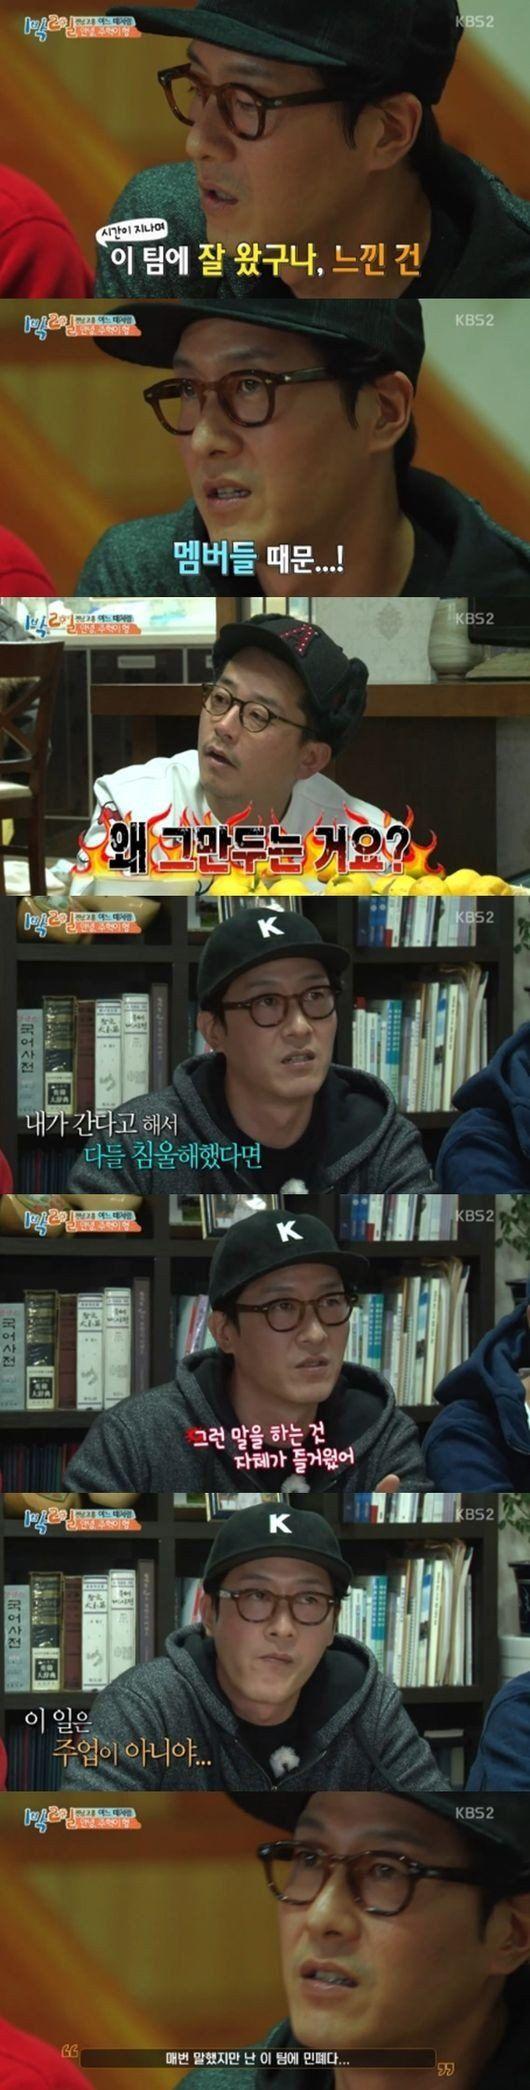 Kim Joo Hyuk believed he was a burden in '1 Night 2 Days' | allkpop.com